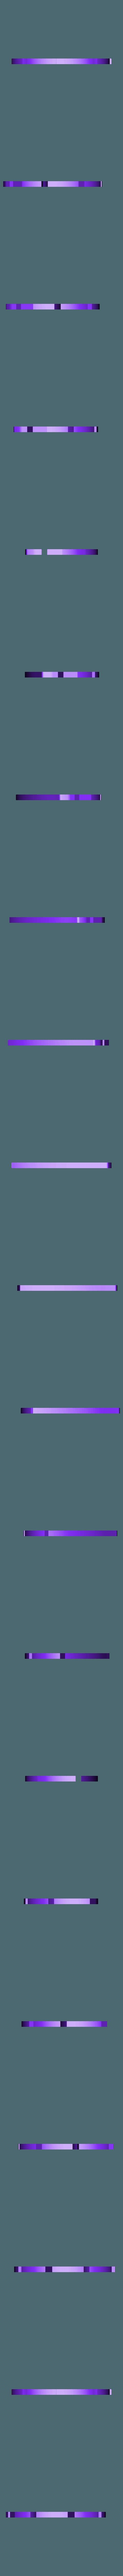 Pelicans_orange.STL Download free STL file Minimal Multi-color NBA coasters • 3D print object, MosaicManufacturing